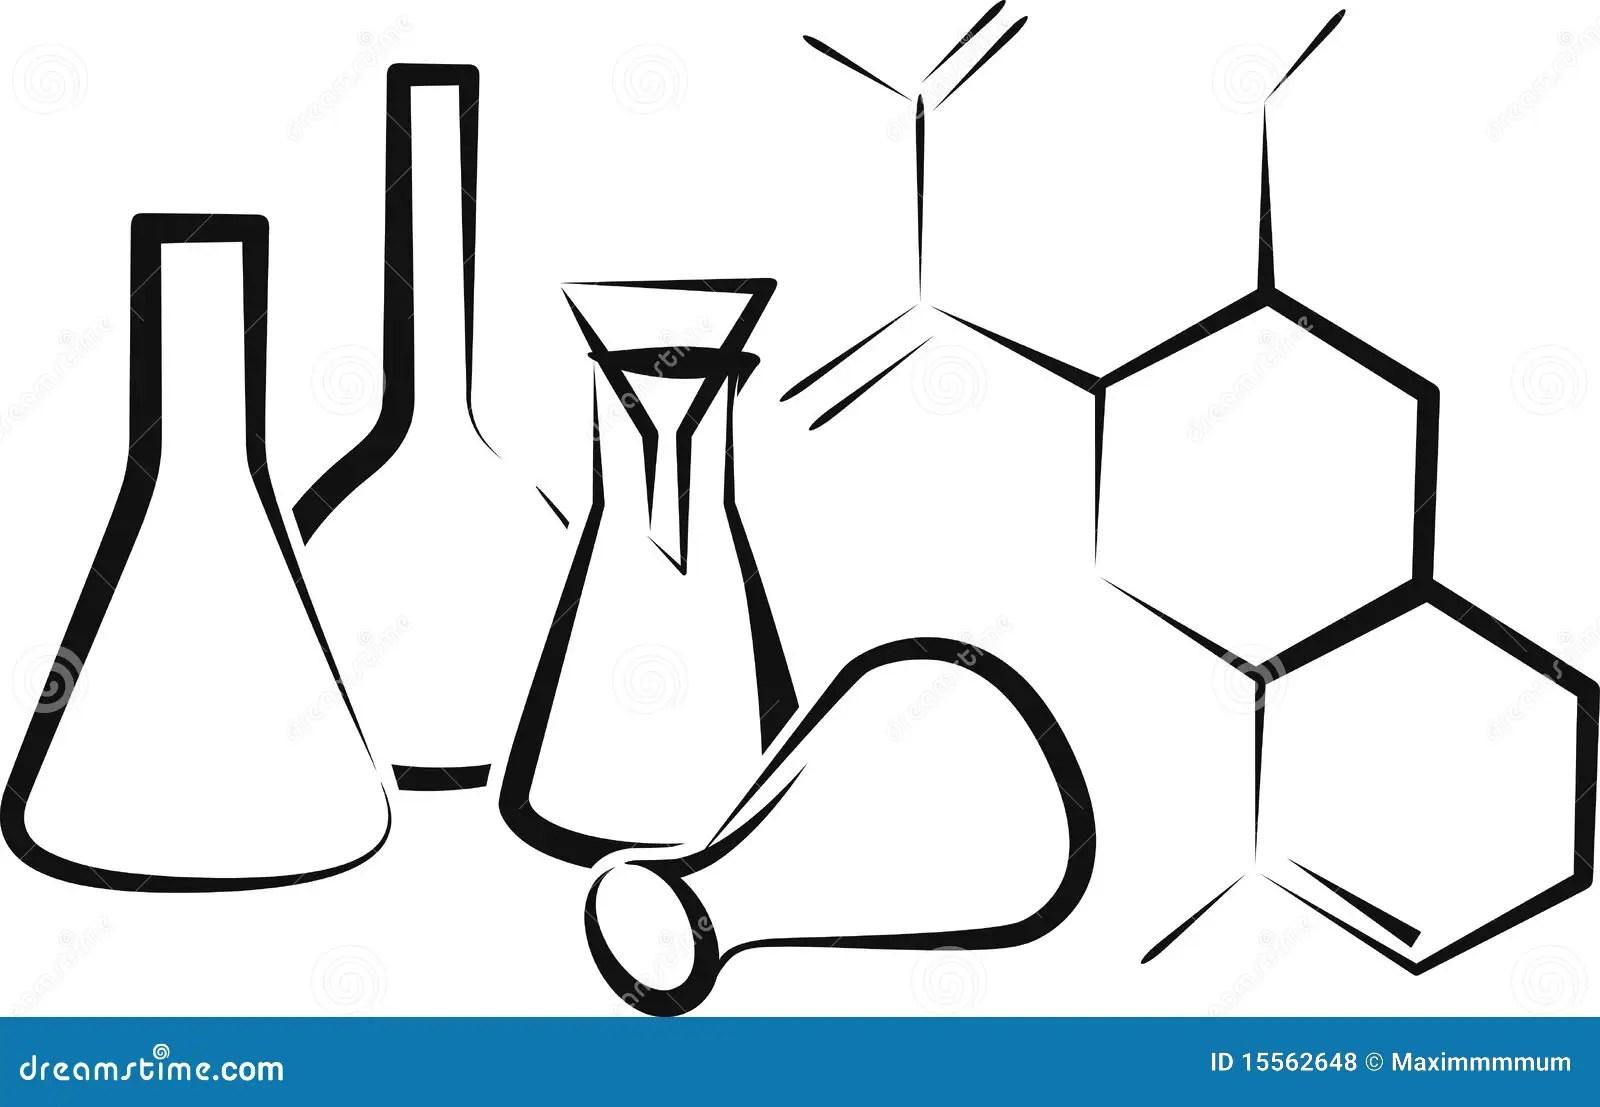 Chemical glassware stock vector. Illustration of chemical